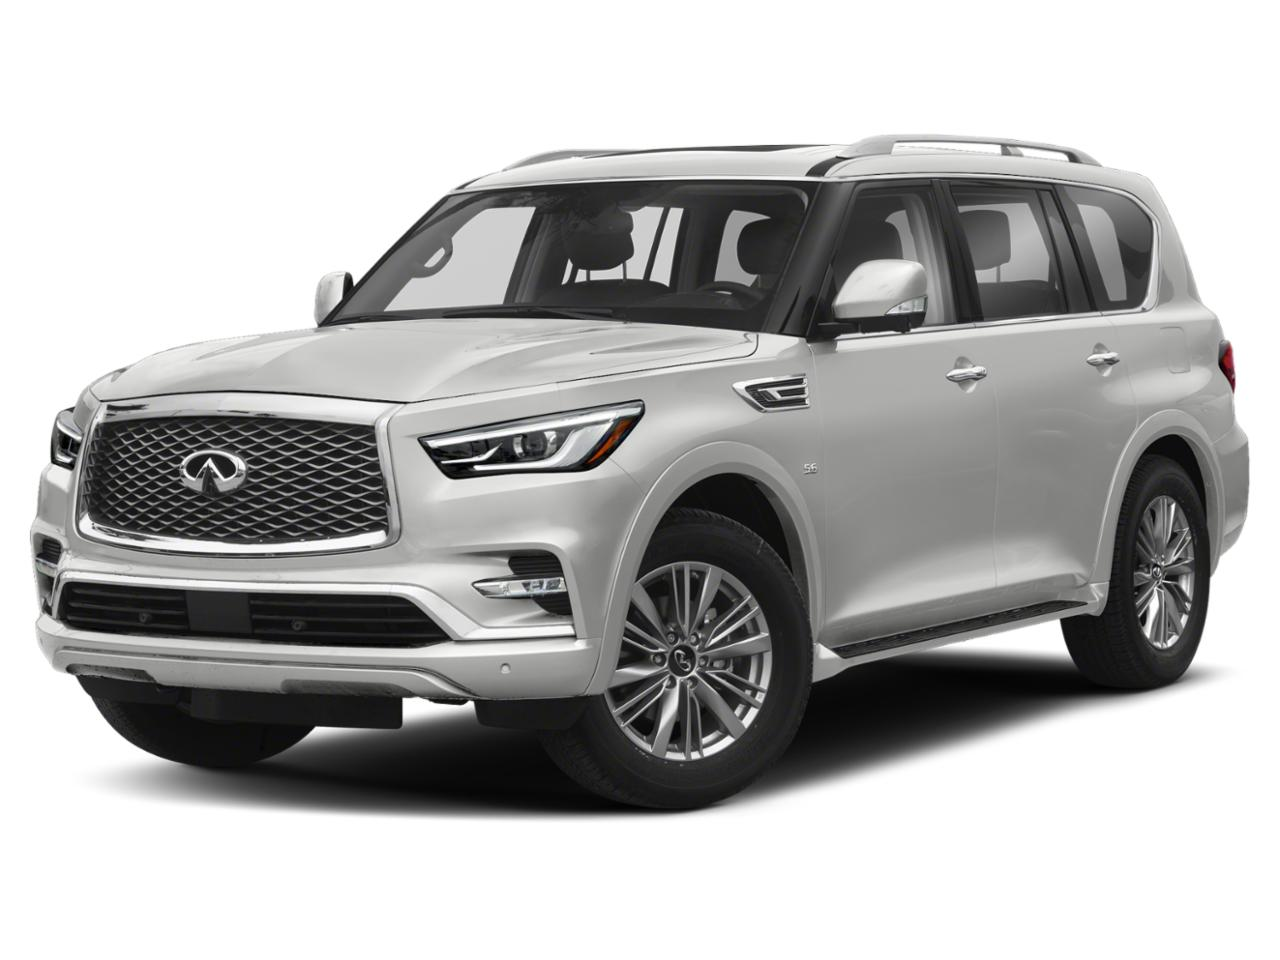 2018 INFINITI QX80 Vehicle Photo in San Antonio, TX 78230